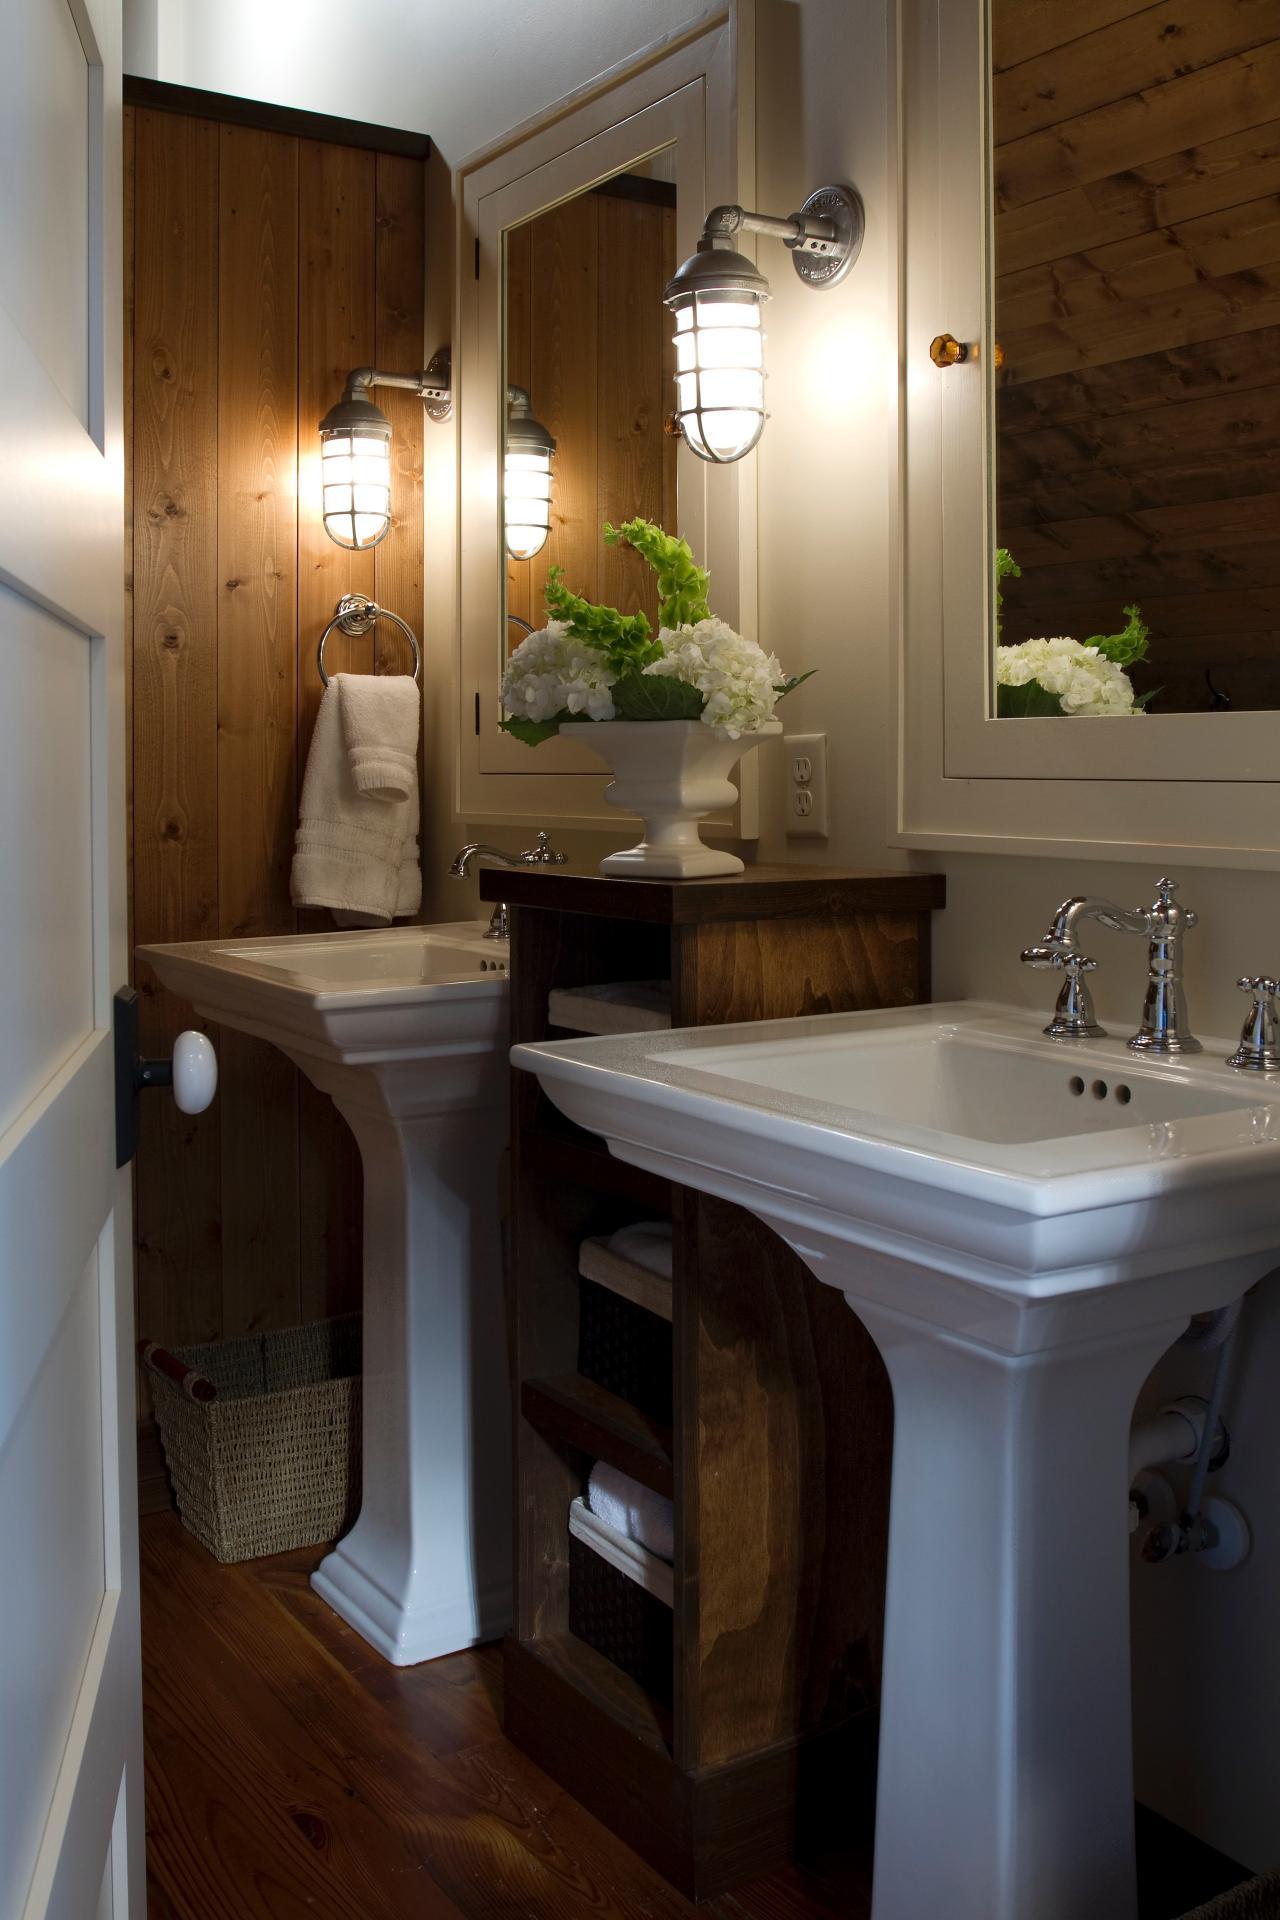 Pedestal Sink In Bathroom : pedestal sinks in traditional bathroom traditional meets country in ...